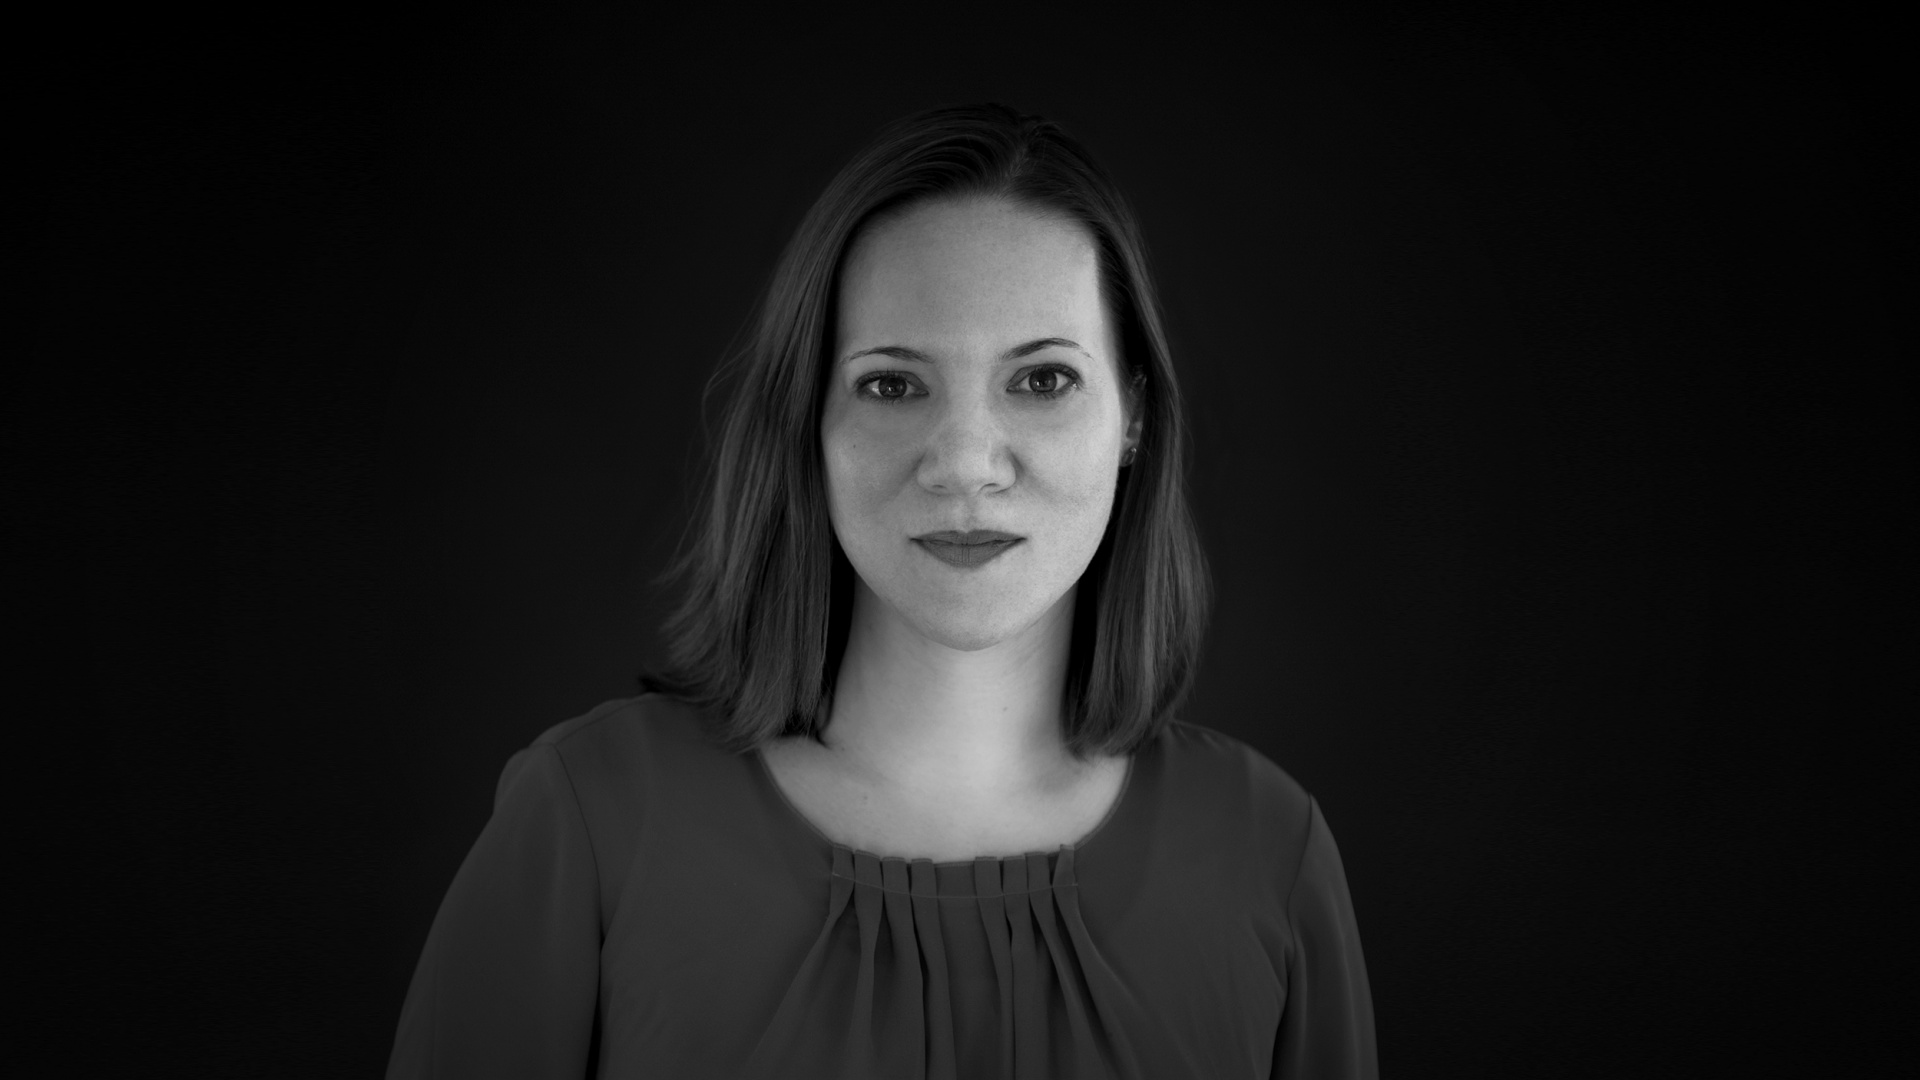 Anja Häberle